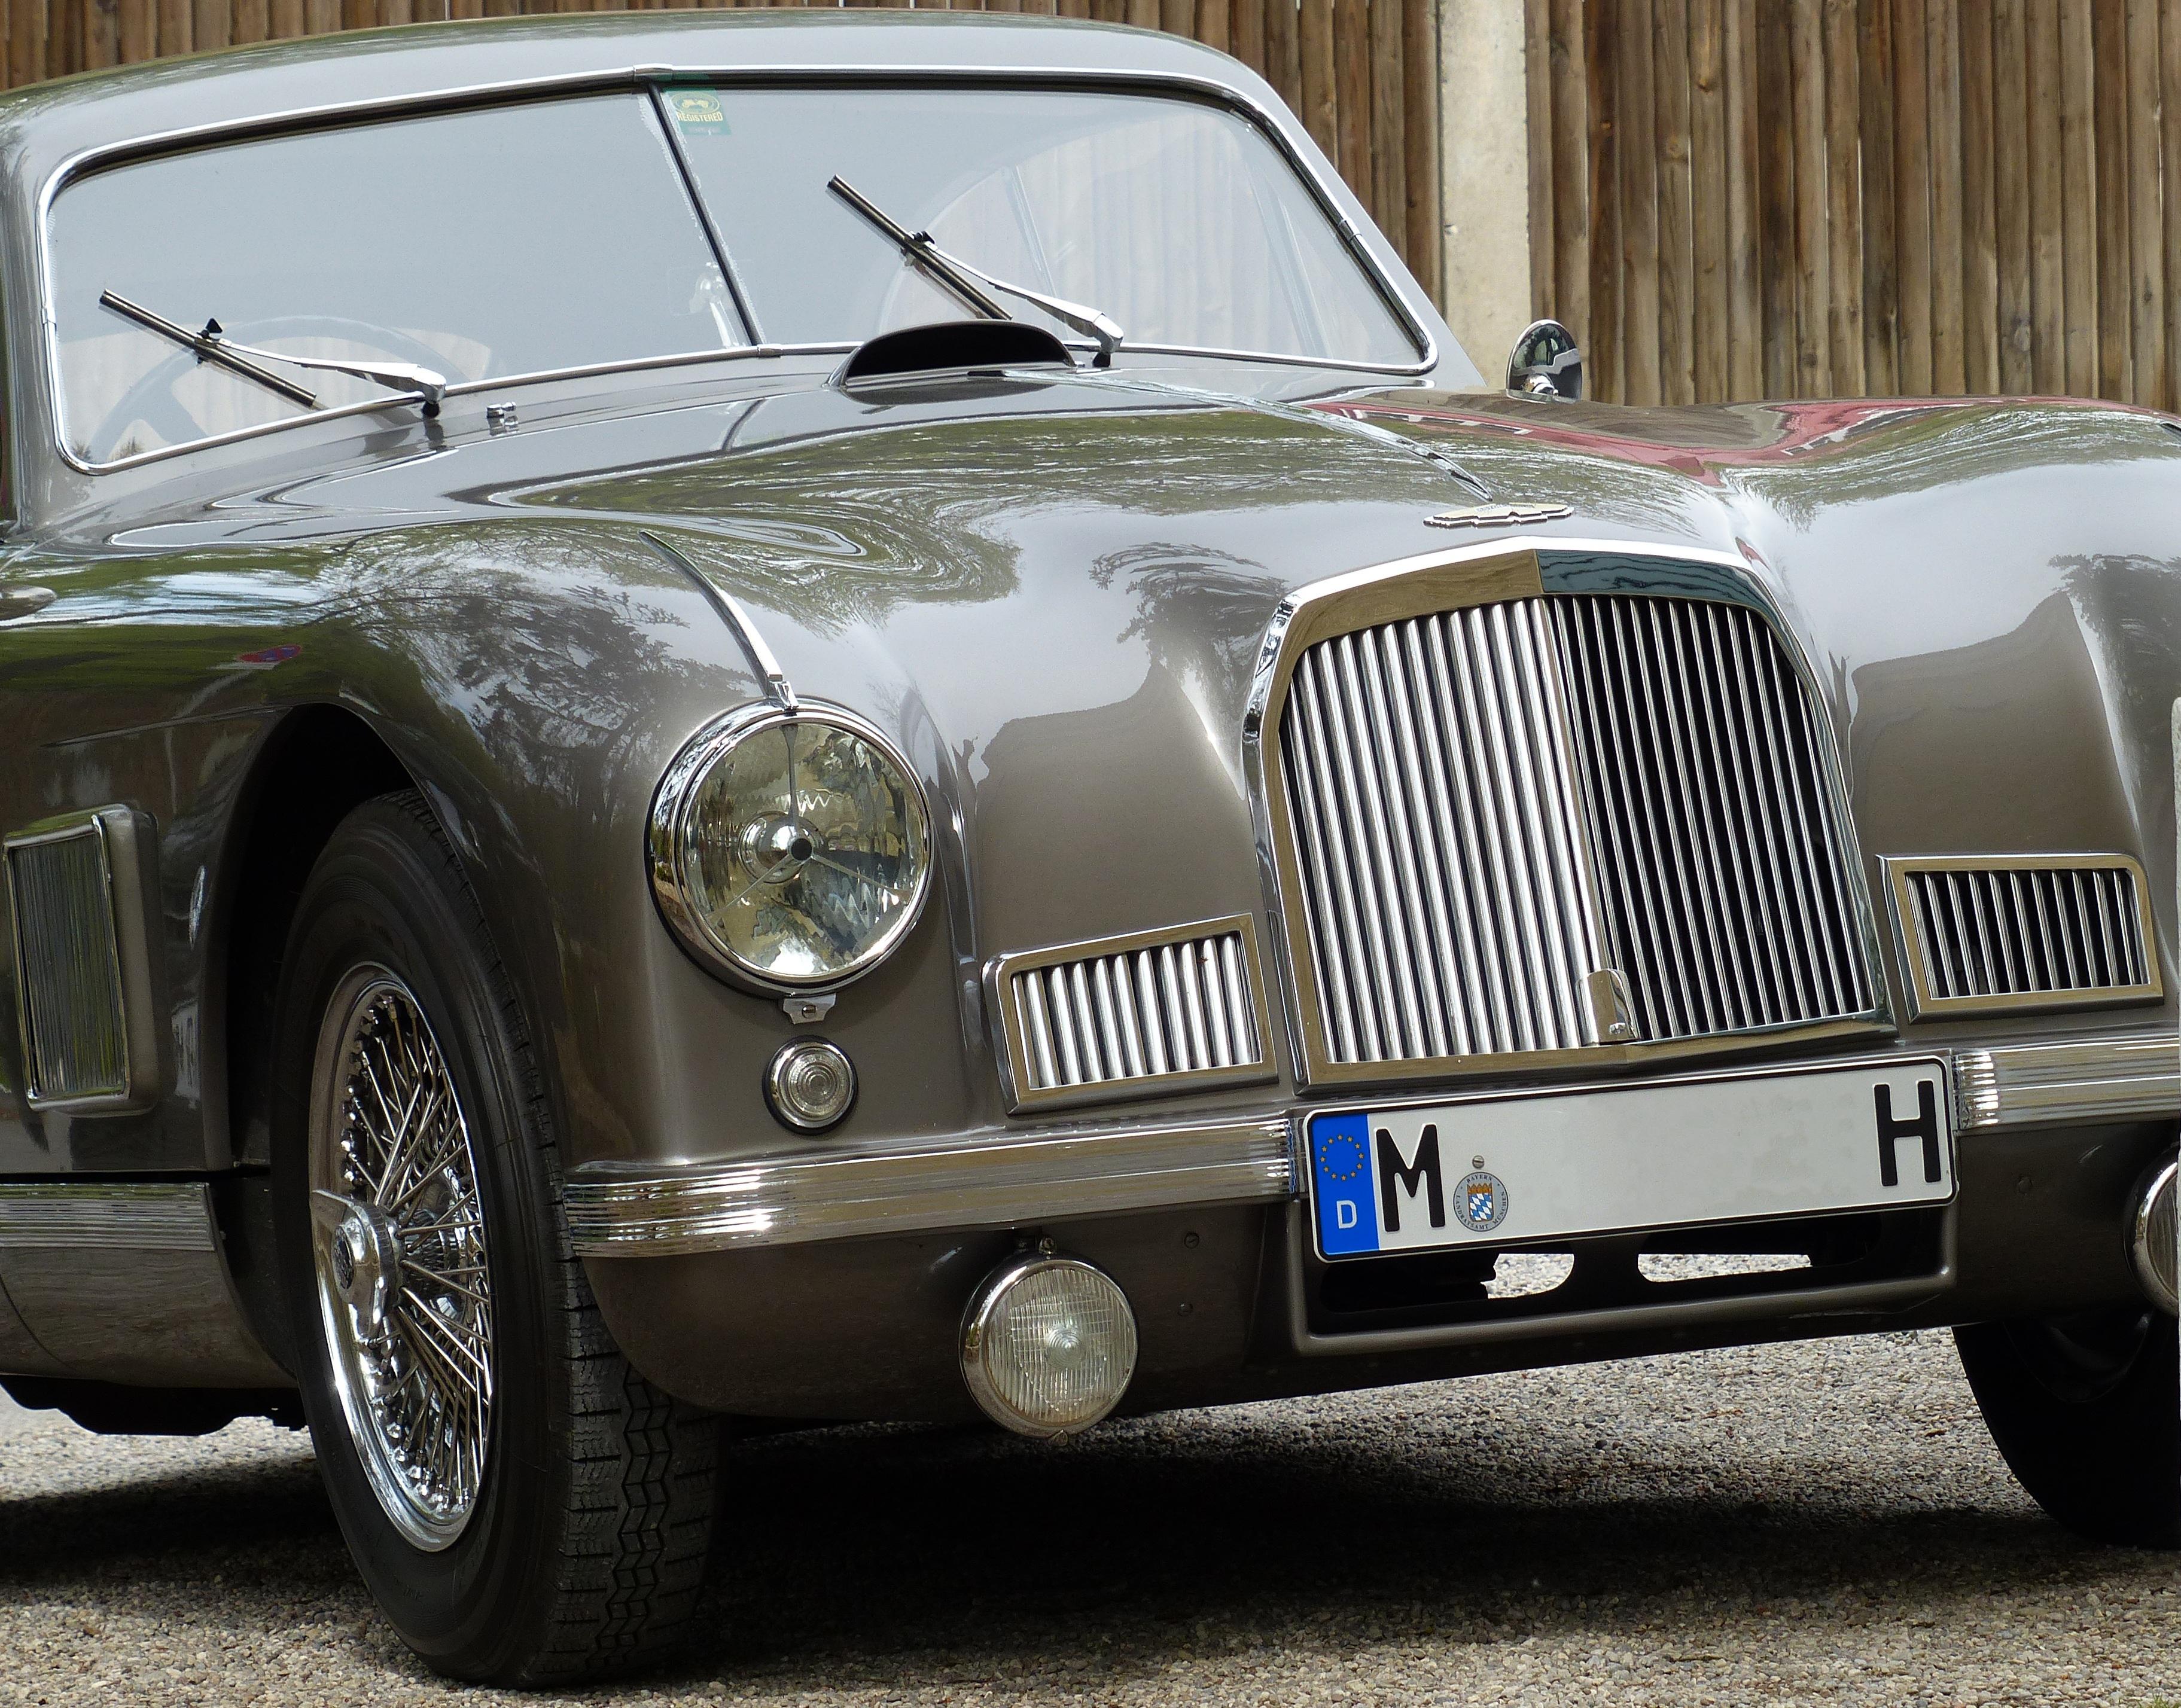 Free Images : auto, classic car, sports car, vintage car, hood ...